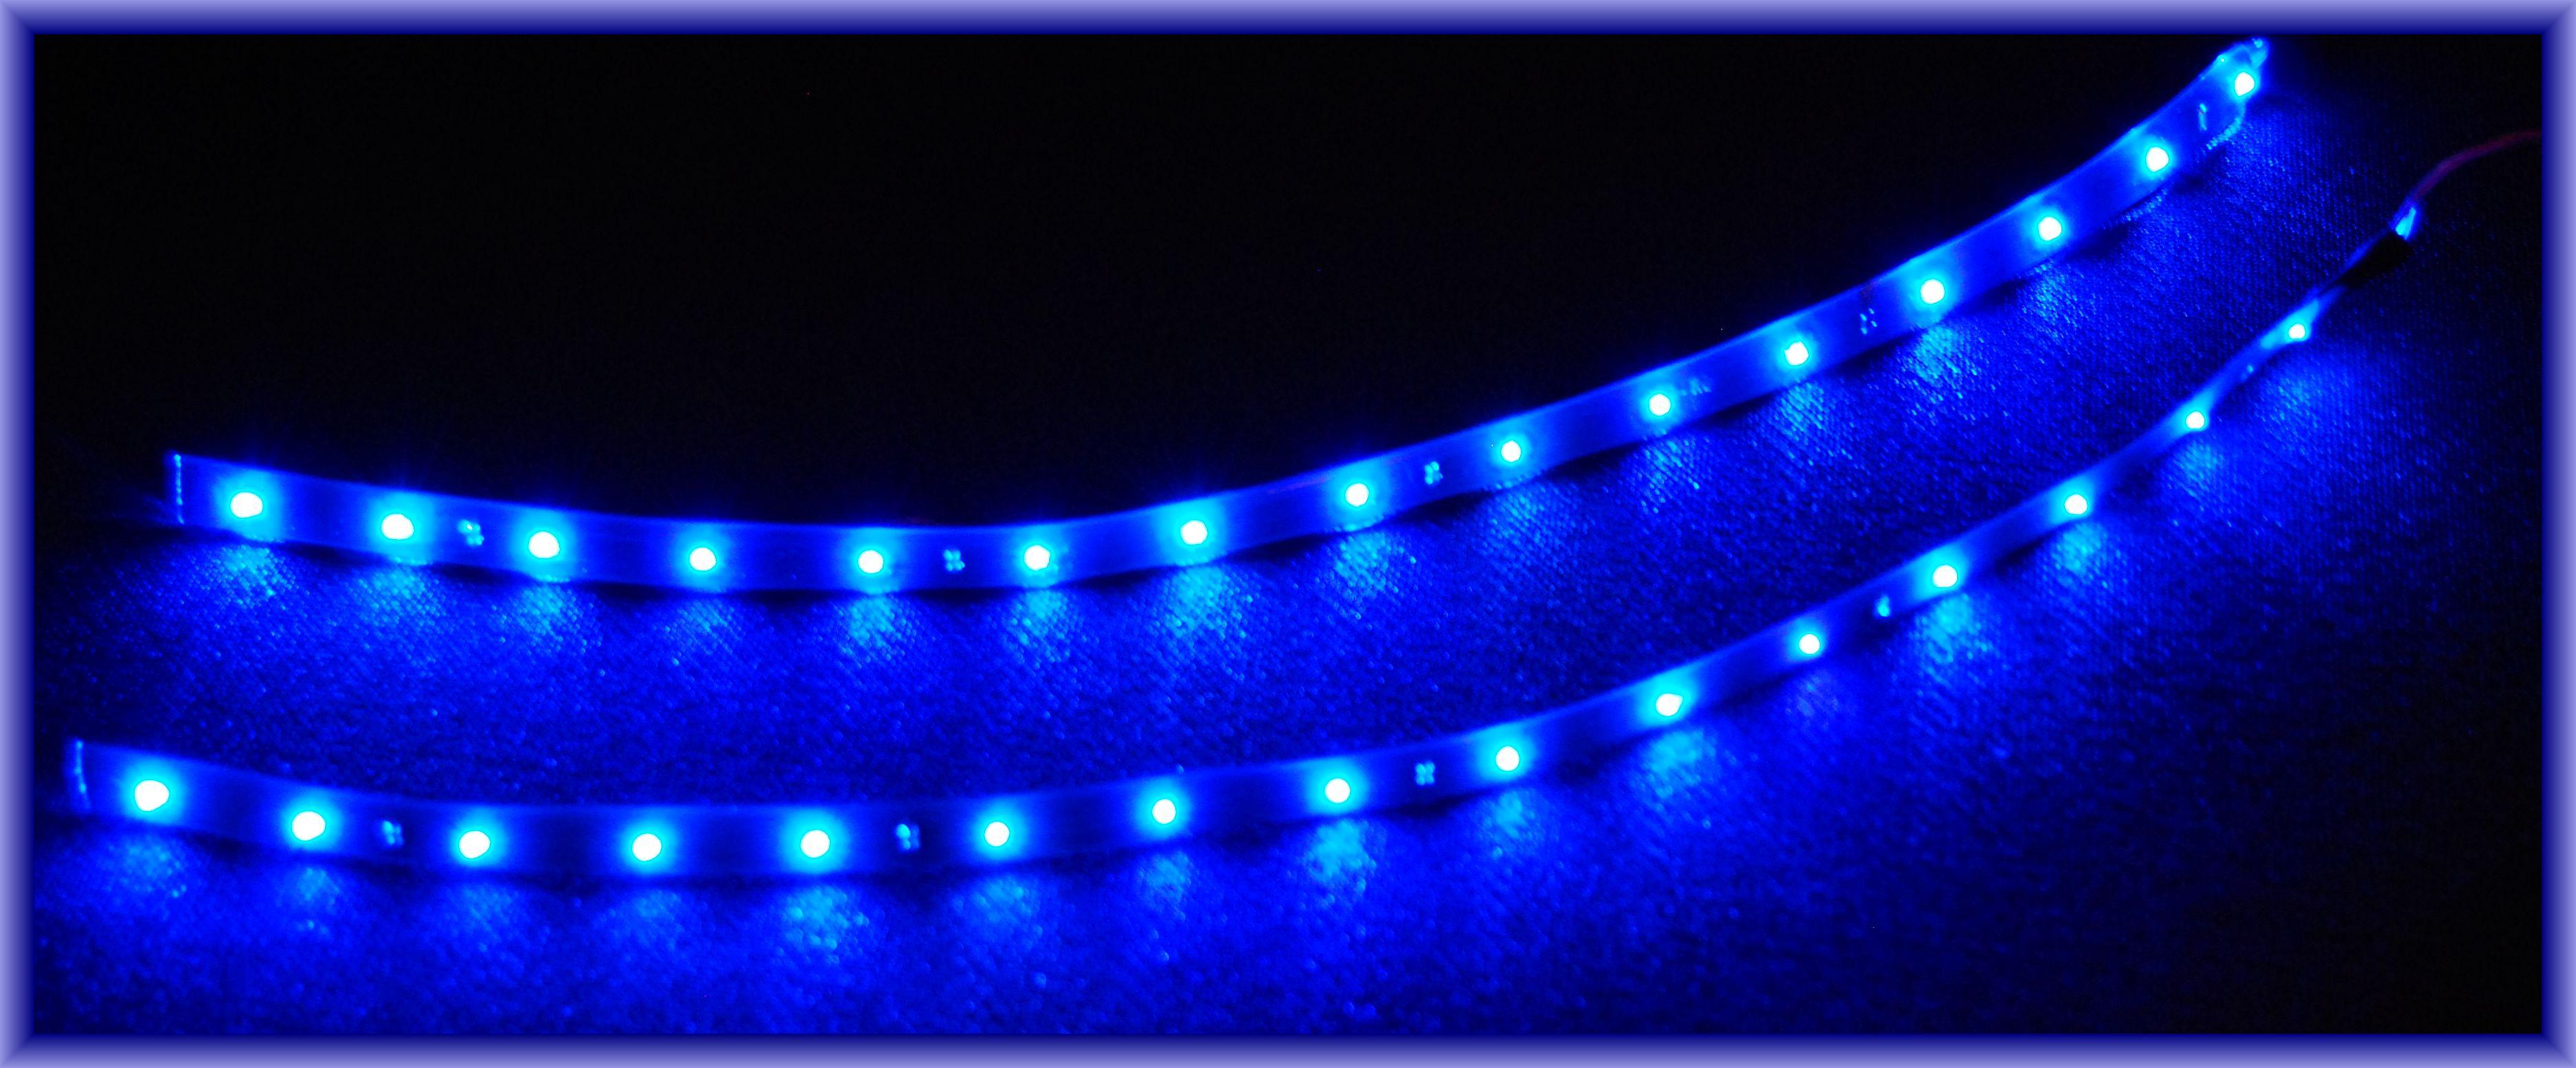 3 x 30cm PC Beleuchtung LED BLAU PC Licht incl. Kabel | eBay